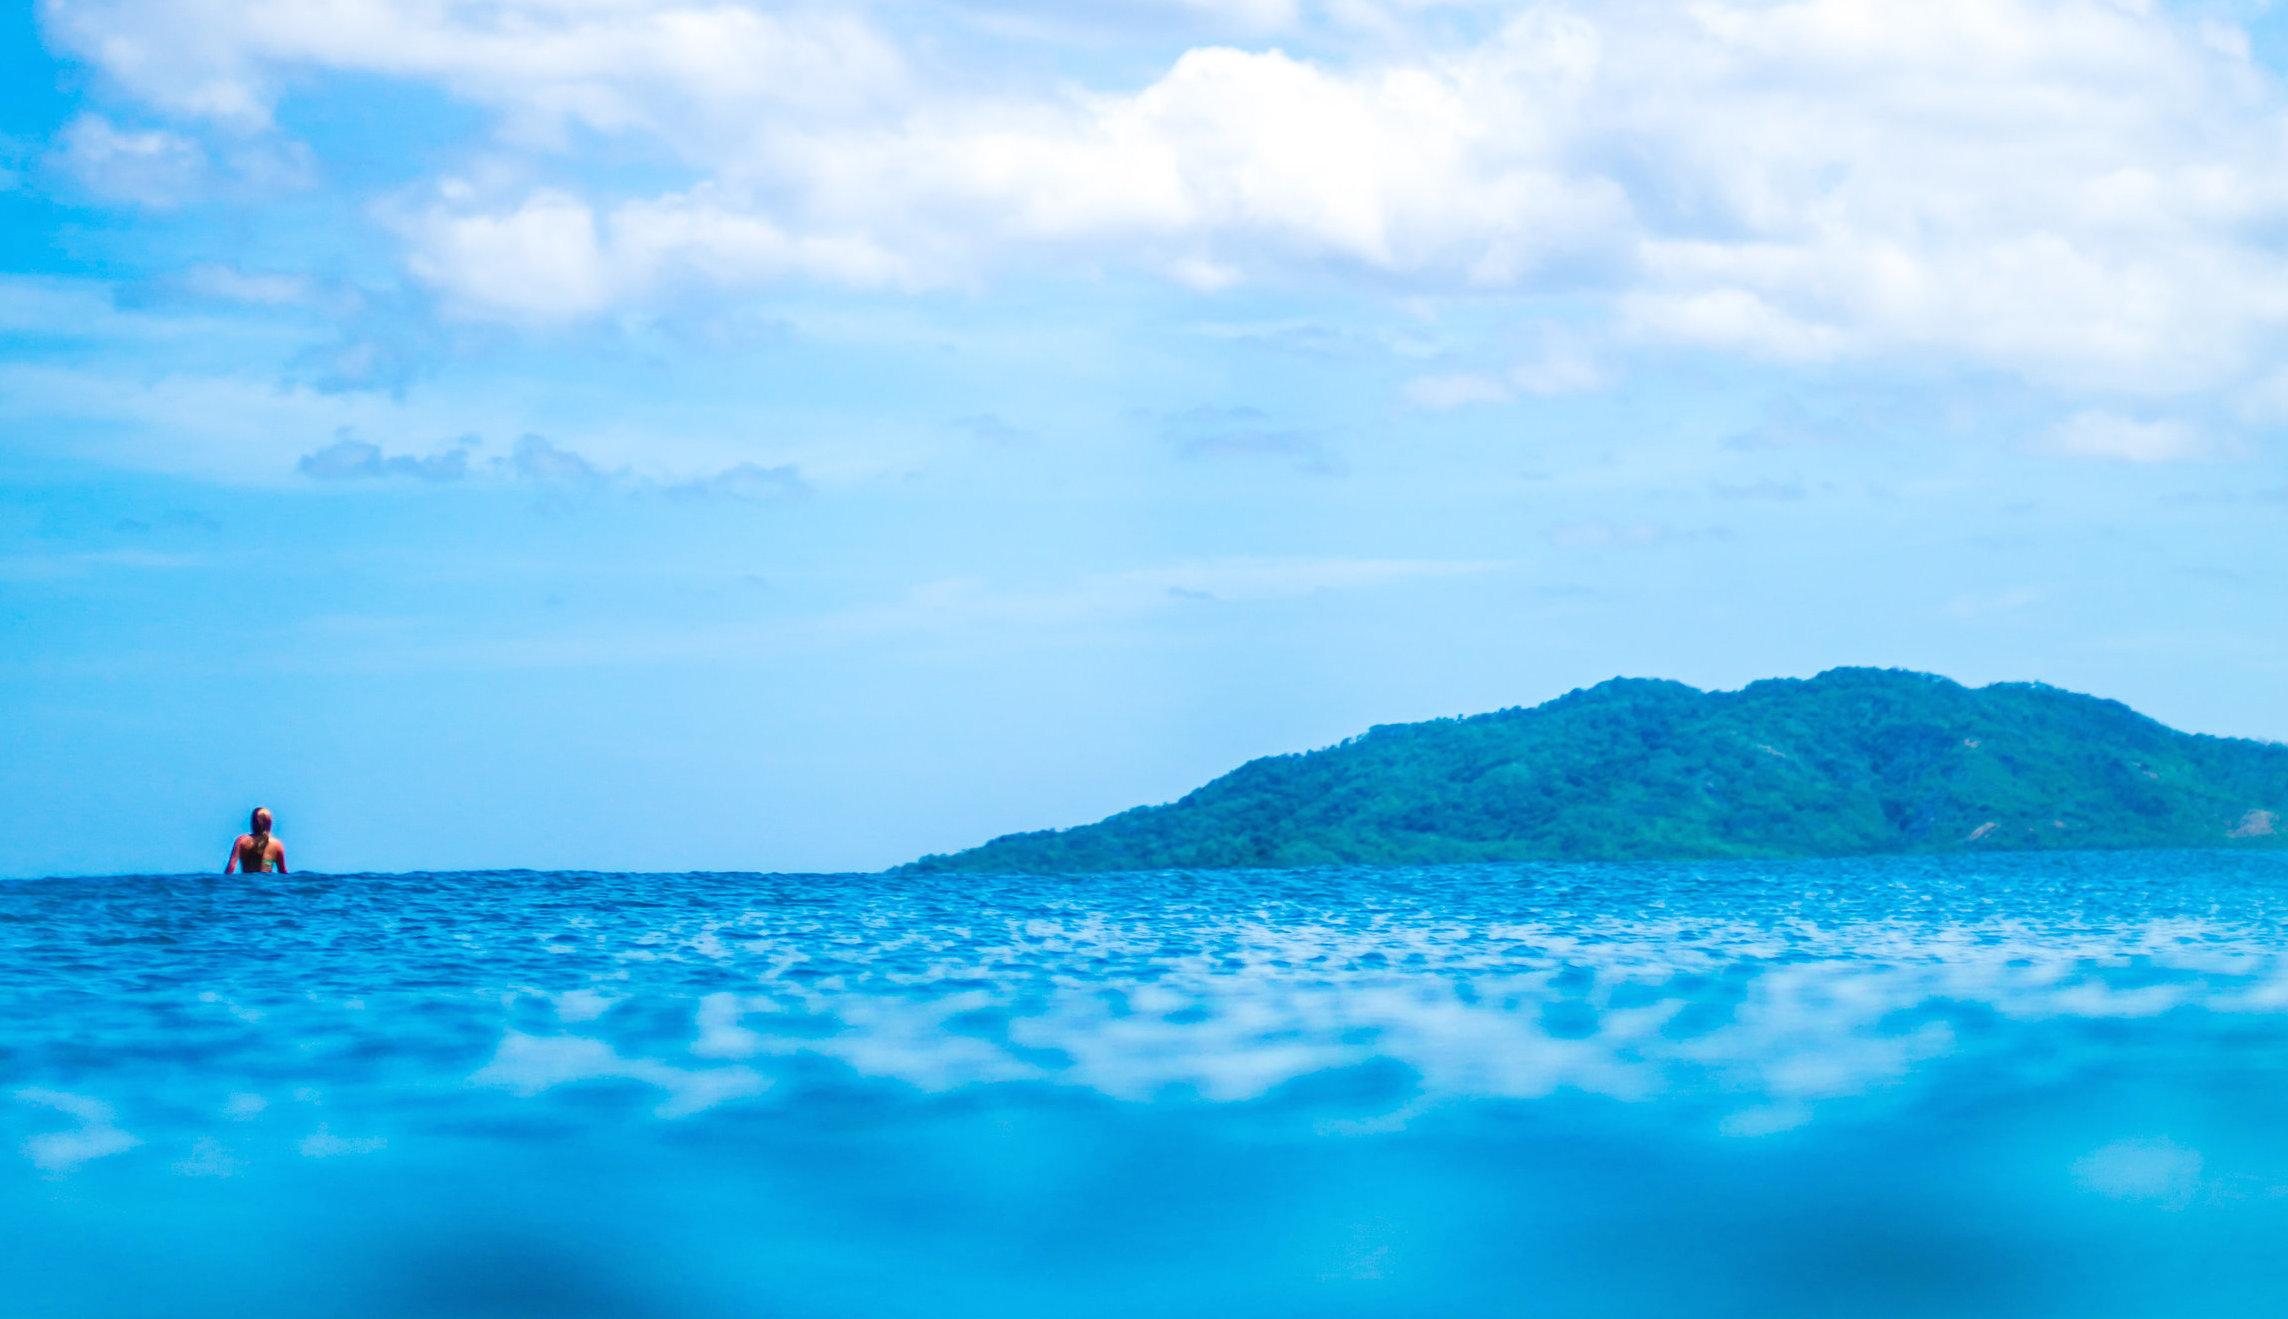 costa rica_surfing_playa grande_jax_2015.jpeg